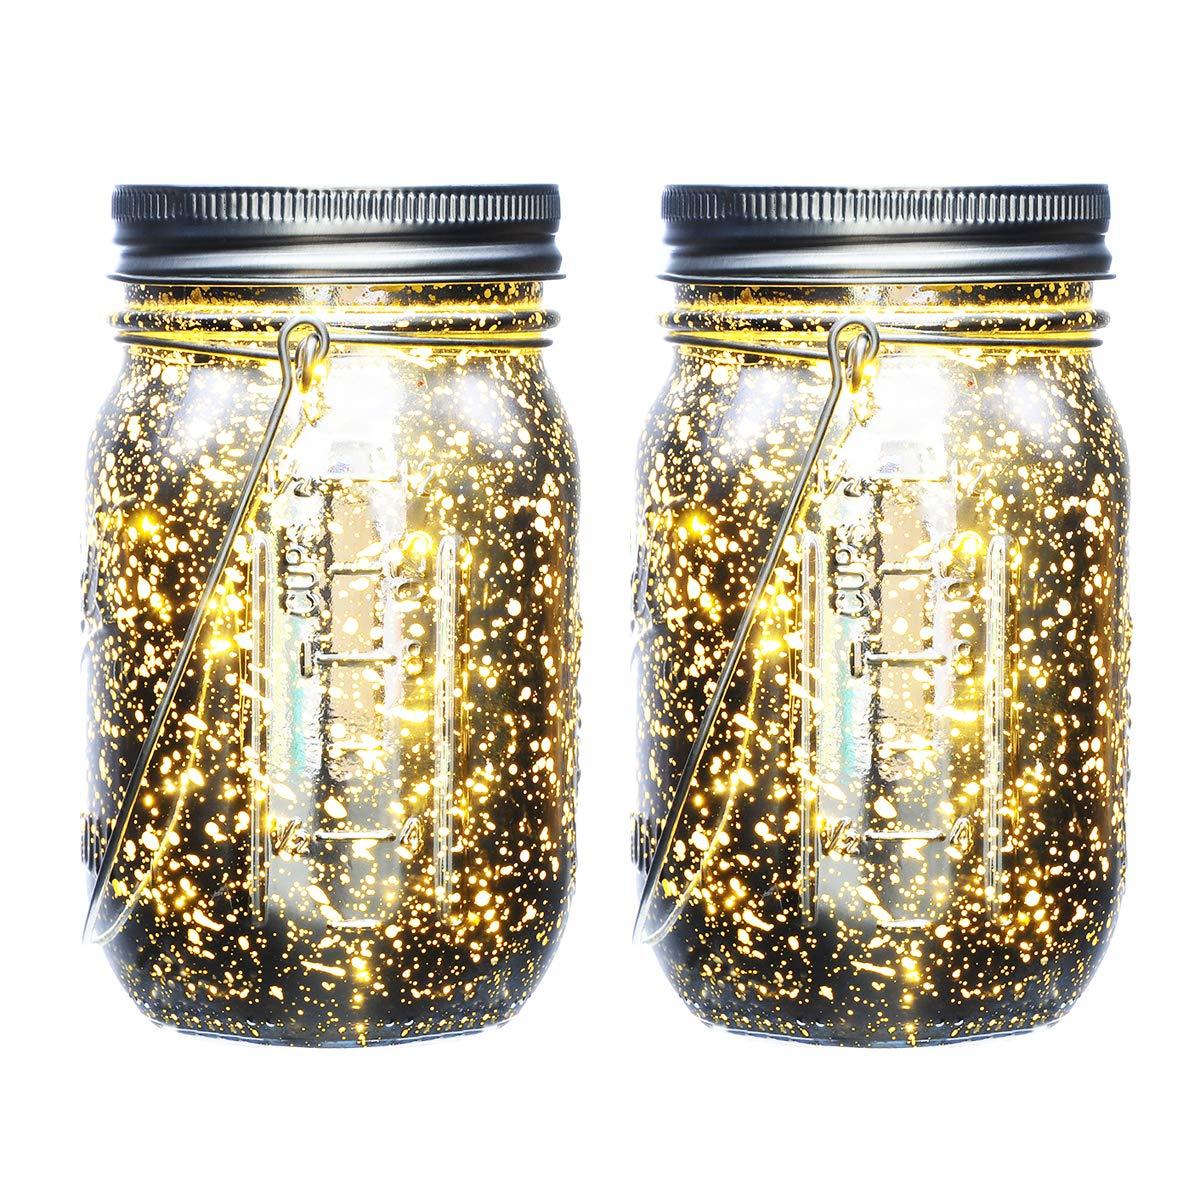 Mason Solar Powered Jar Lights IThird